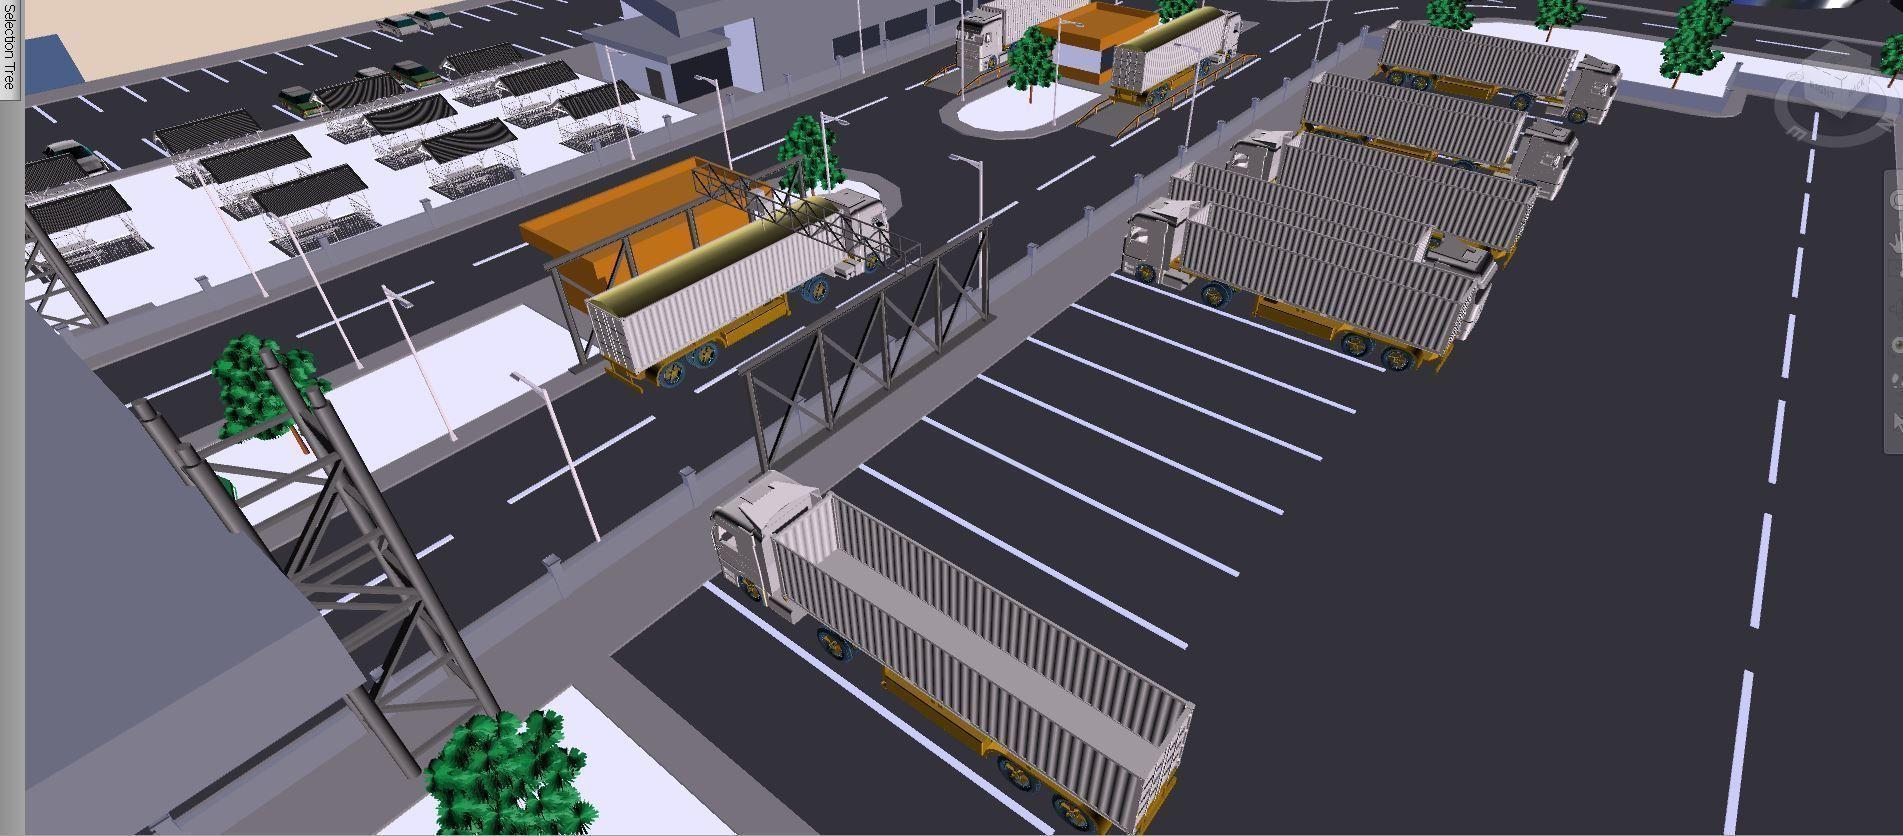 factory design detailed model 3d model dwg - عملیات ترافیکی شهرکی